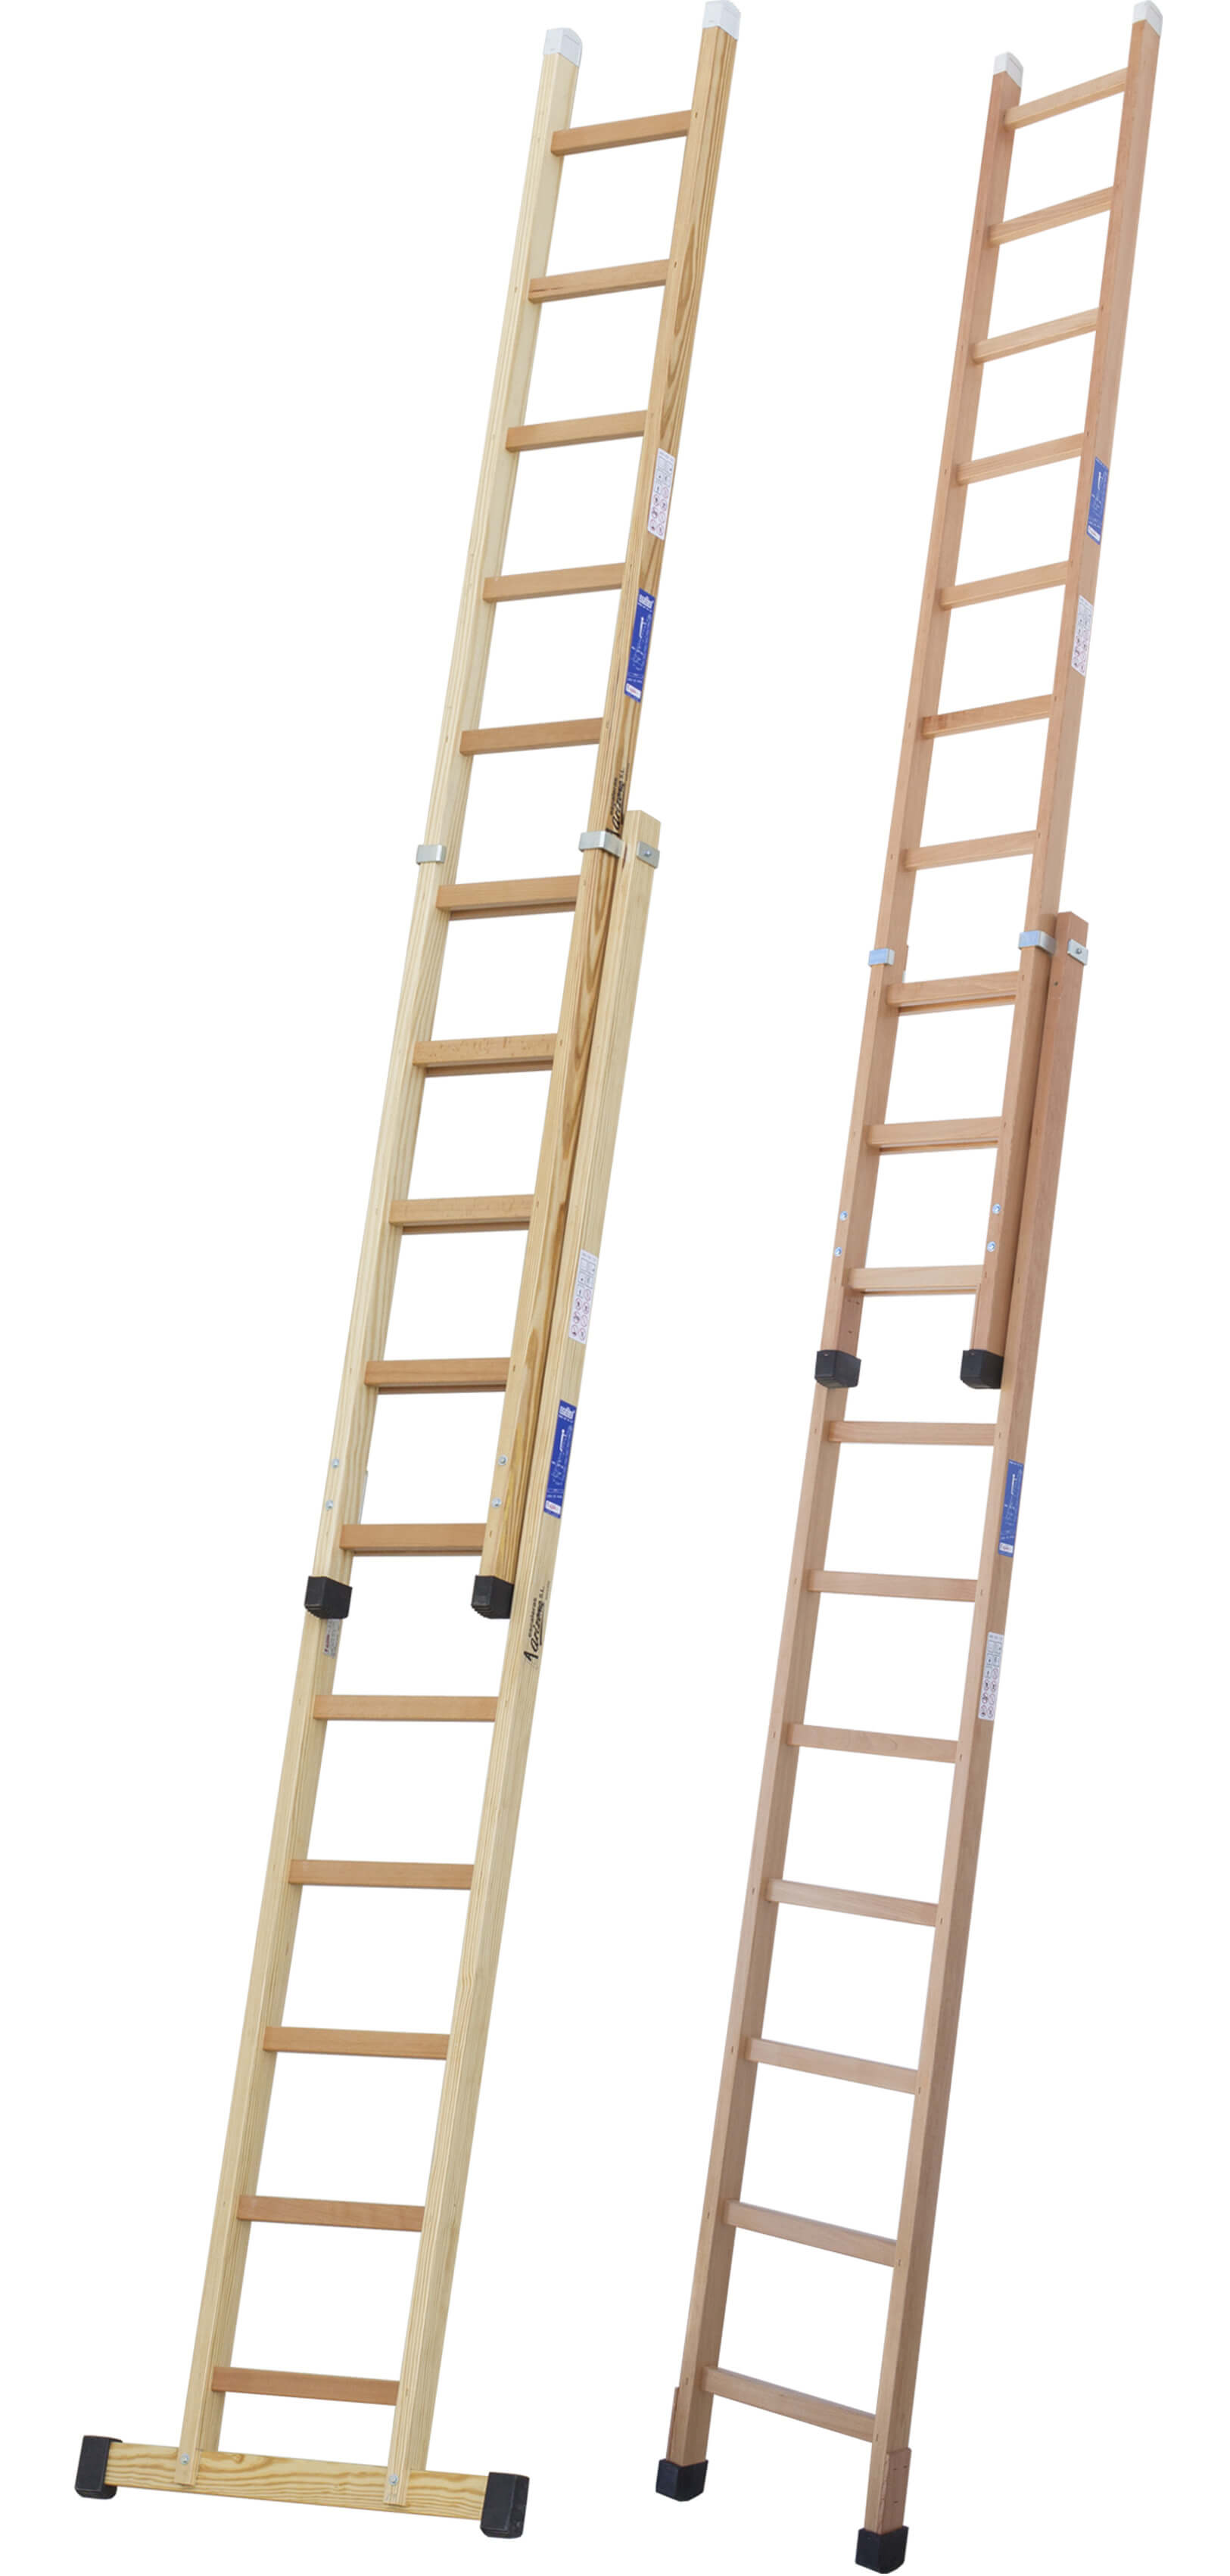 Escalera de madera extensible manual escaleras arizona - Escaleras de madera ...